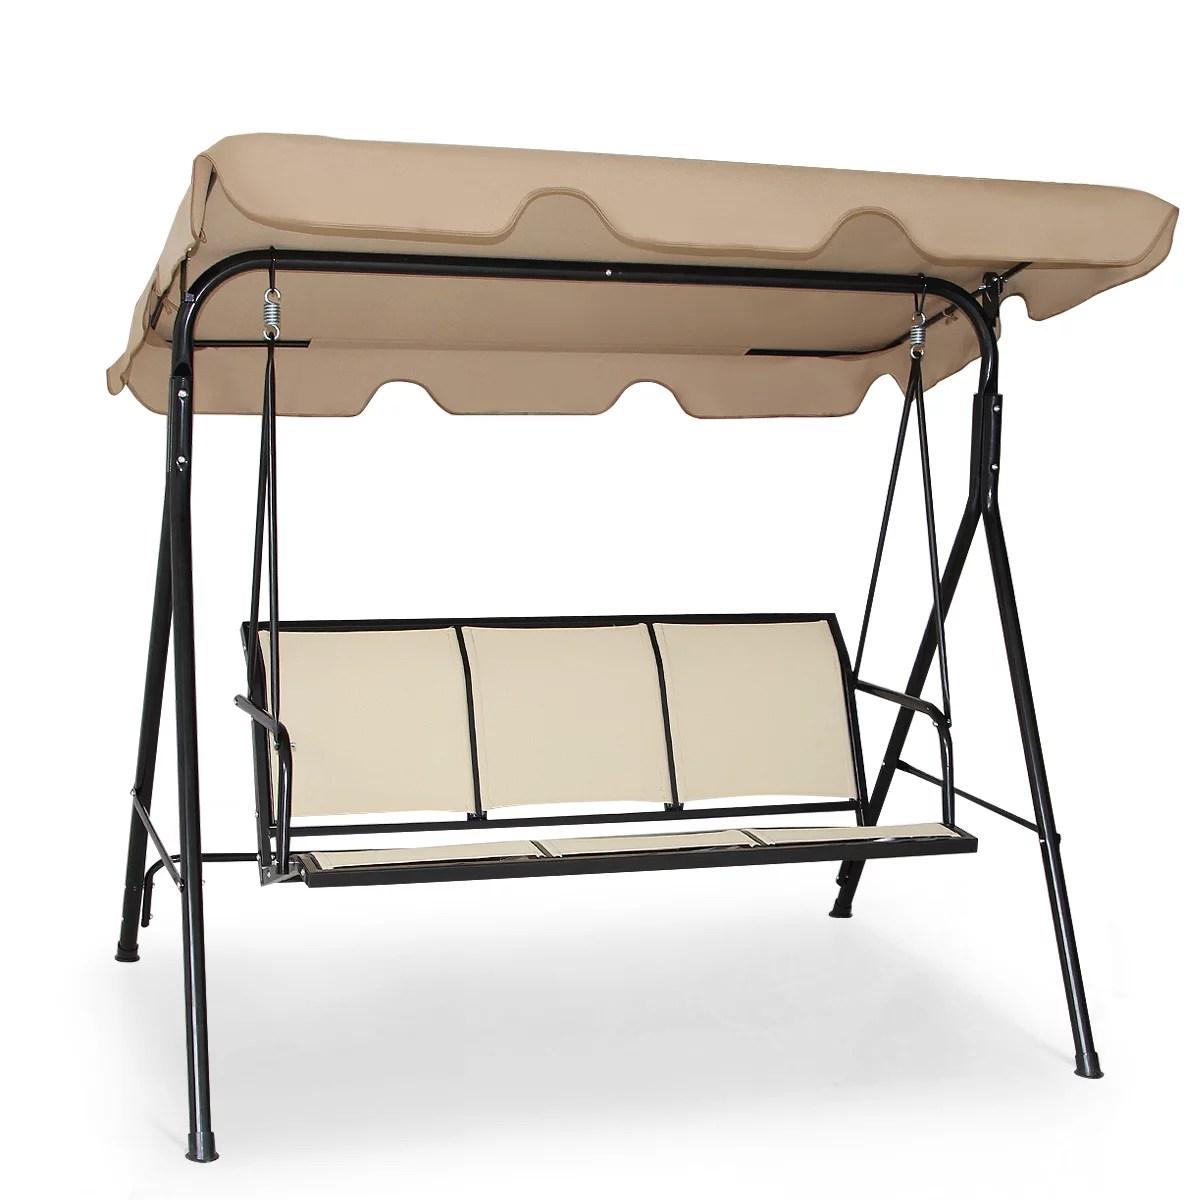 costway outdoor patio swing canopy 3 person canopy swing chair patio hammock brown walmart com